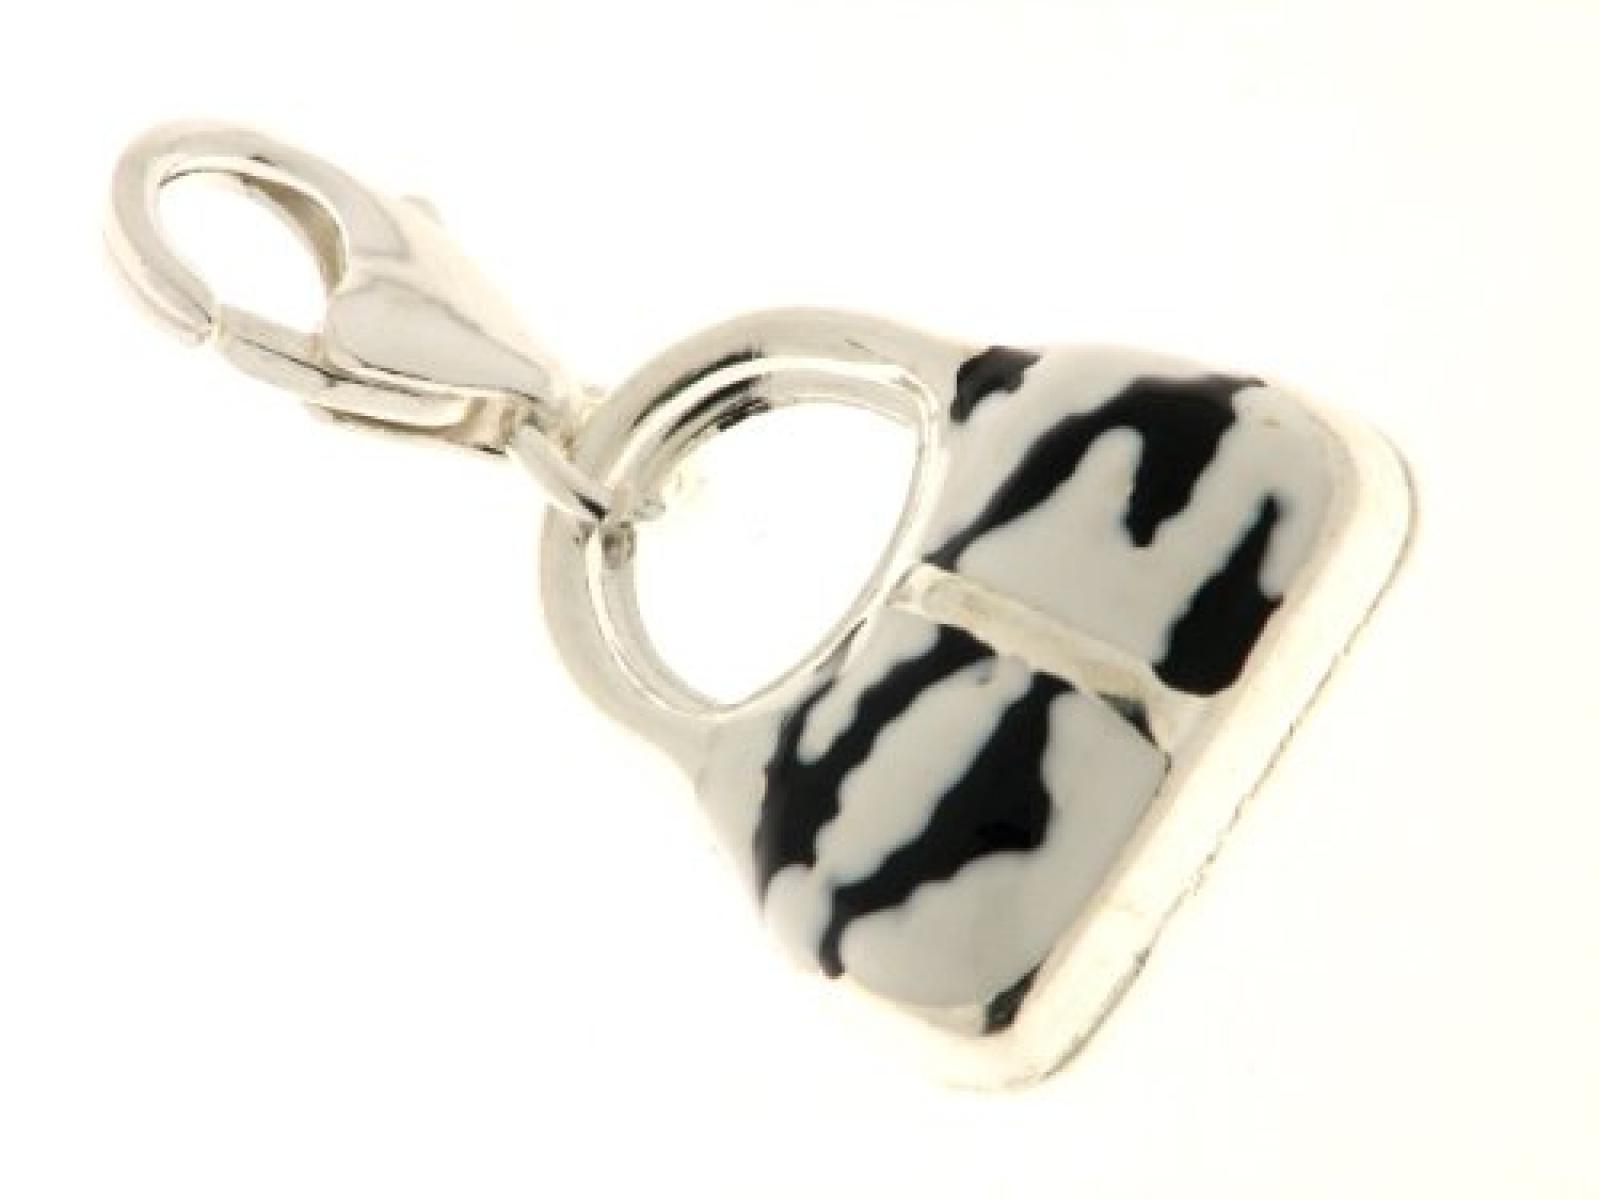 Bob C Damen-Charm Handtasche Sterling-Silber 925 282357